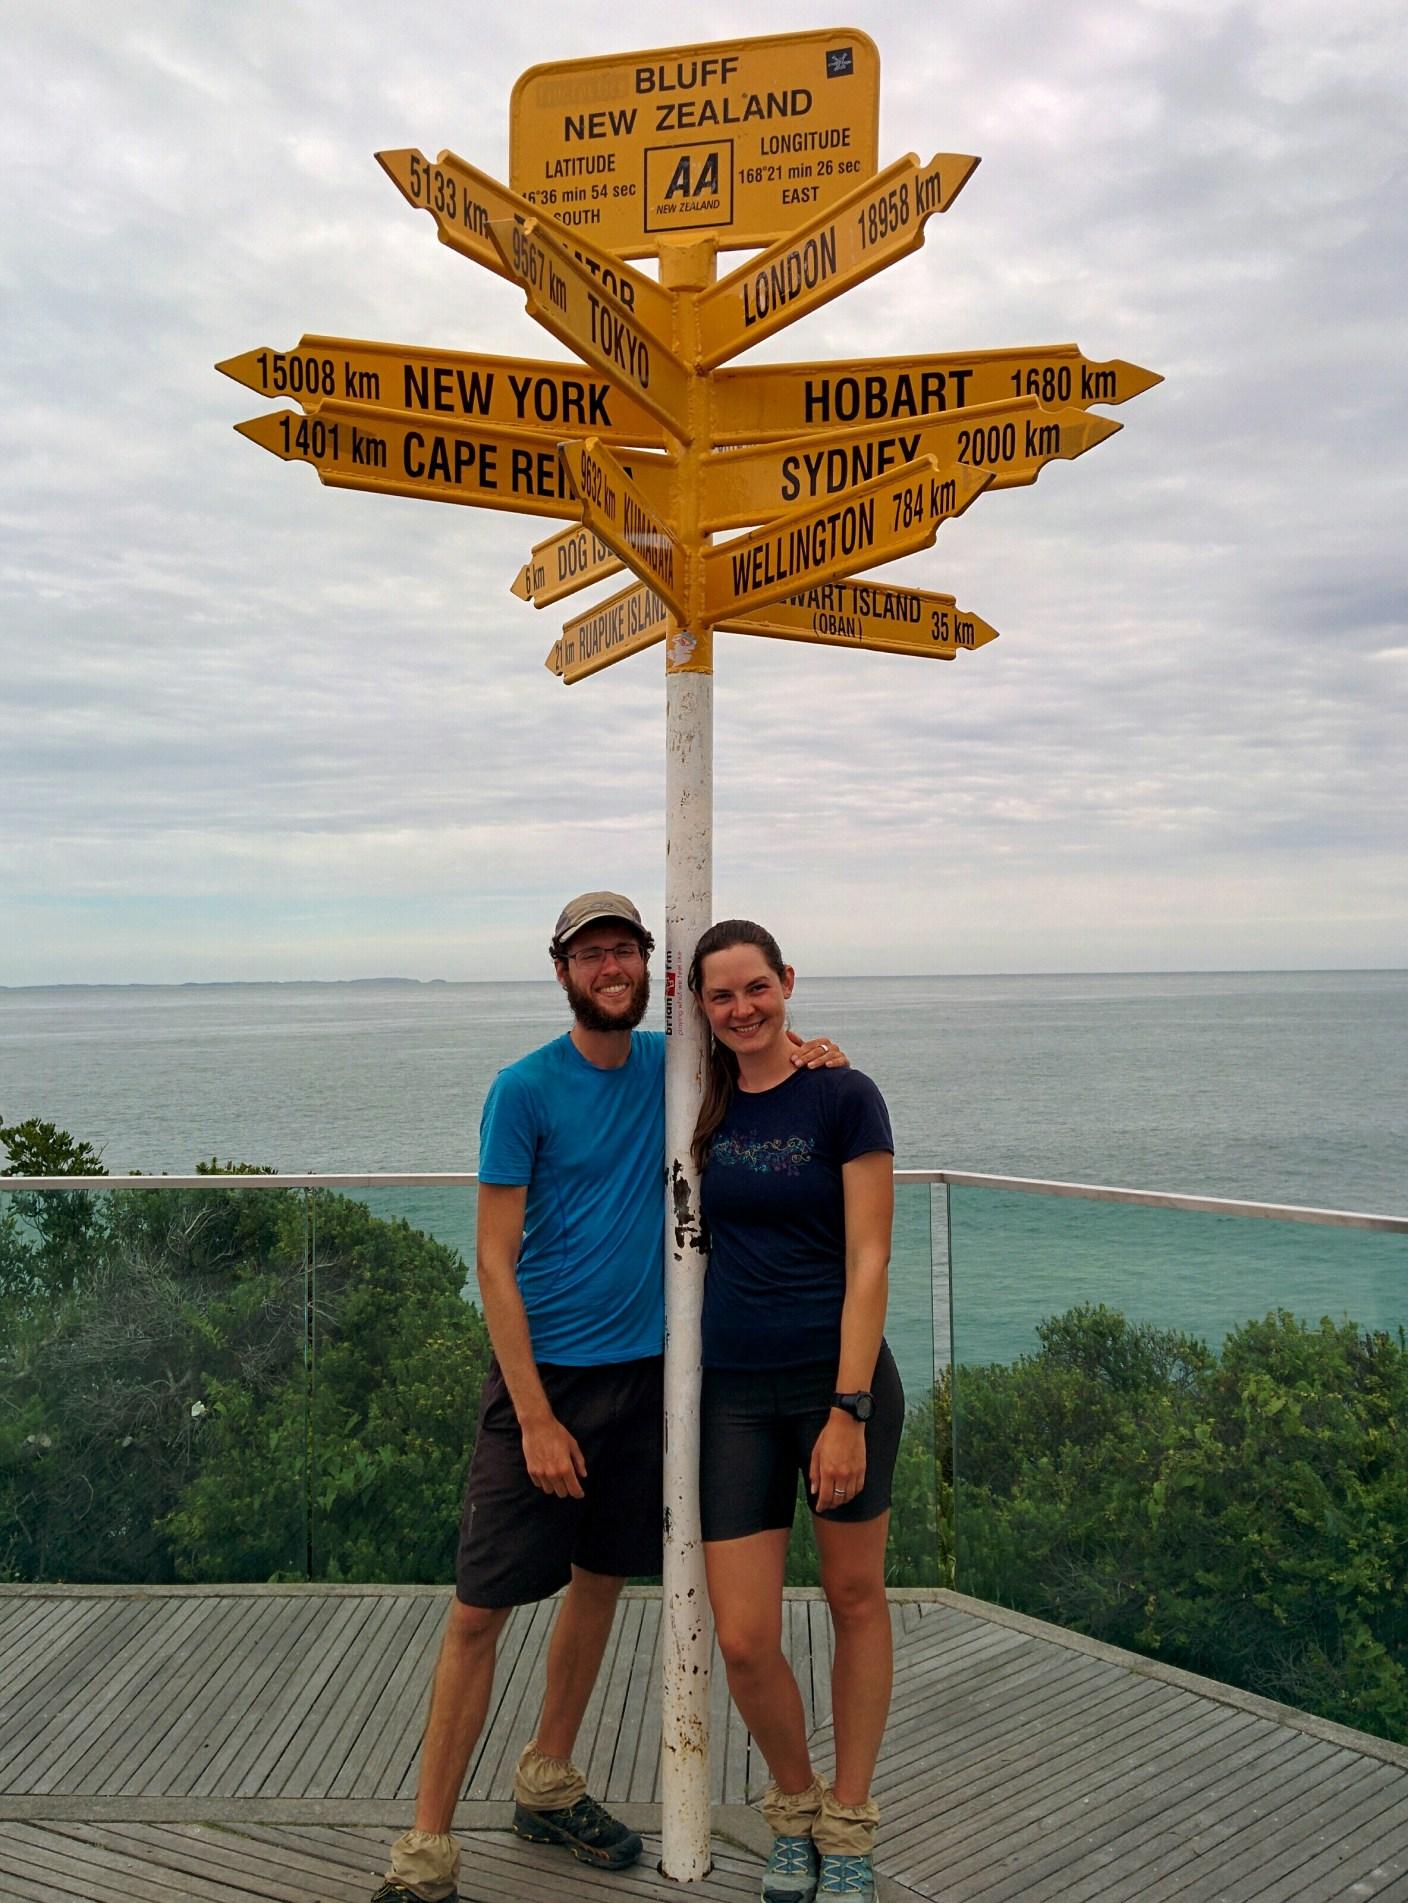 Nadine und Philippe vom Blog Gustofrenzy